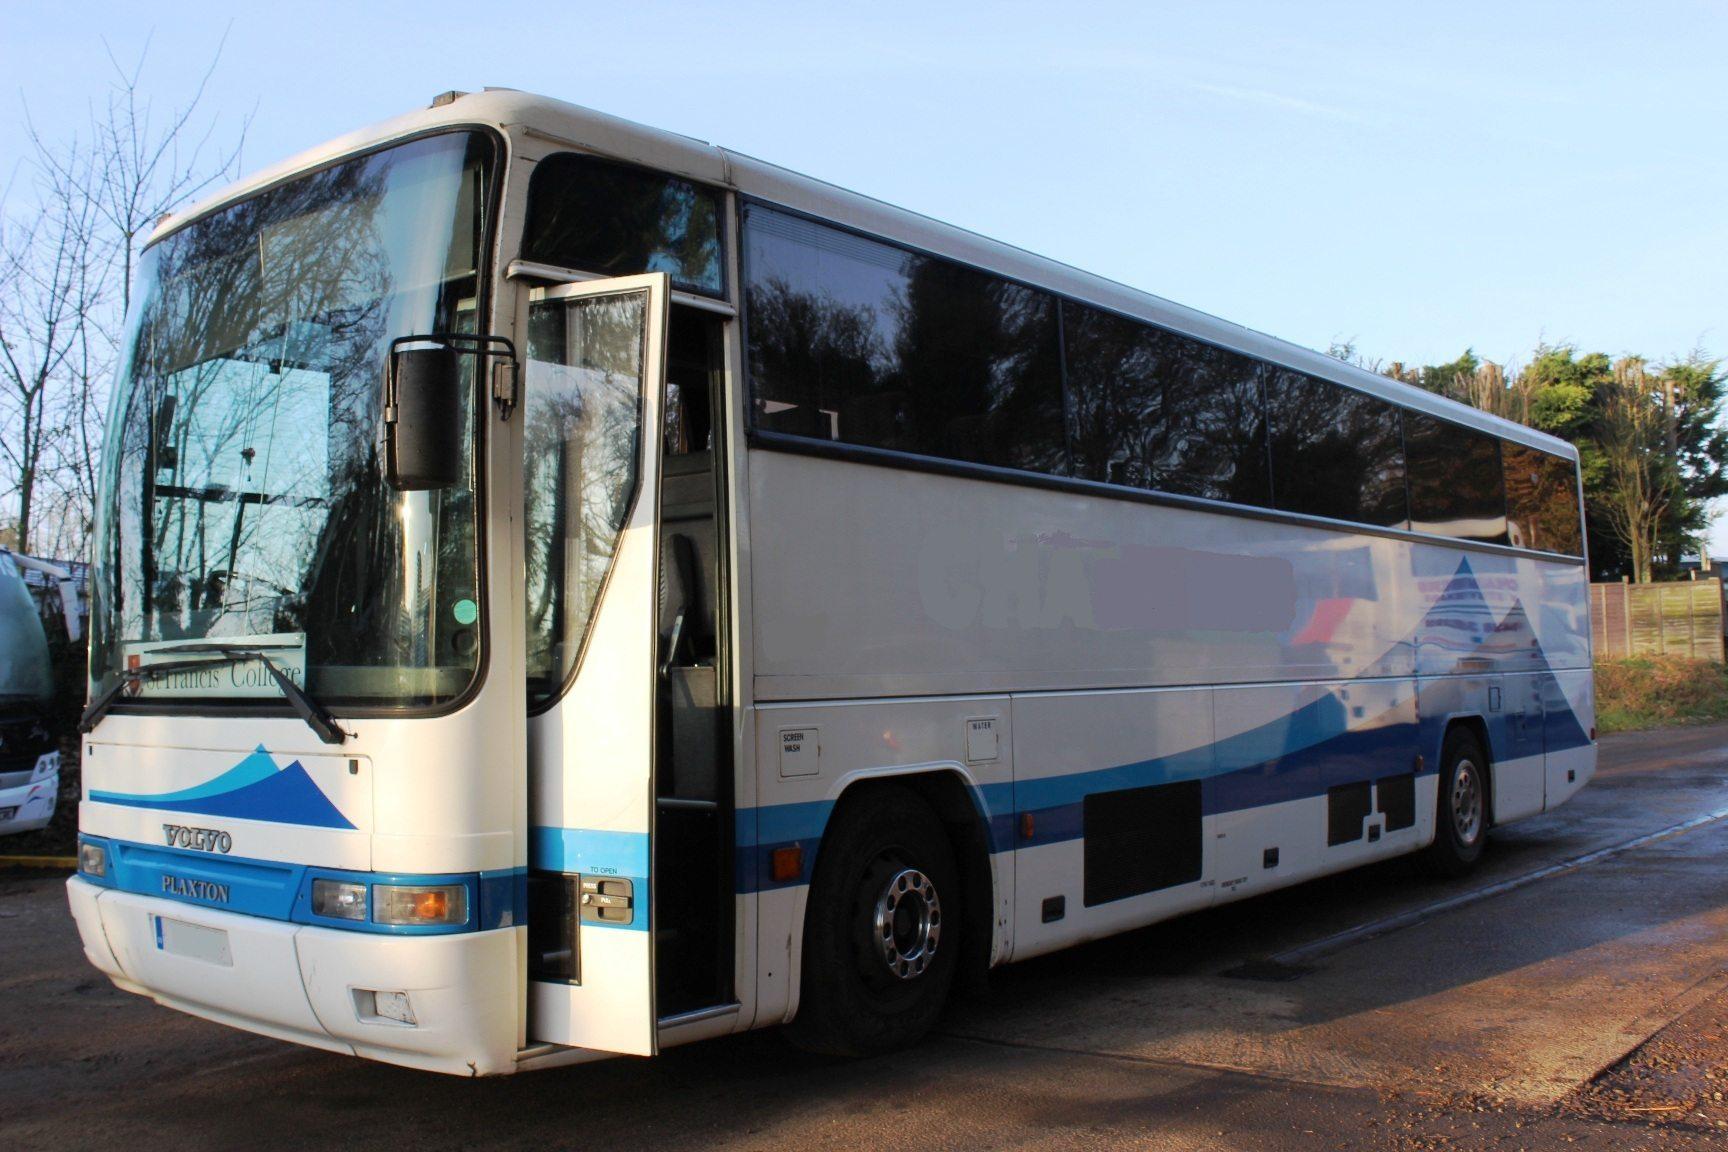 97 VOLVO B10M PLAXTON PREMIER 48 SEATS - Hills Coaches